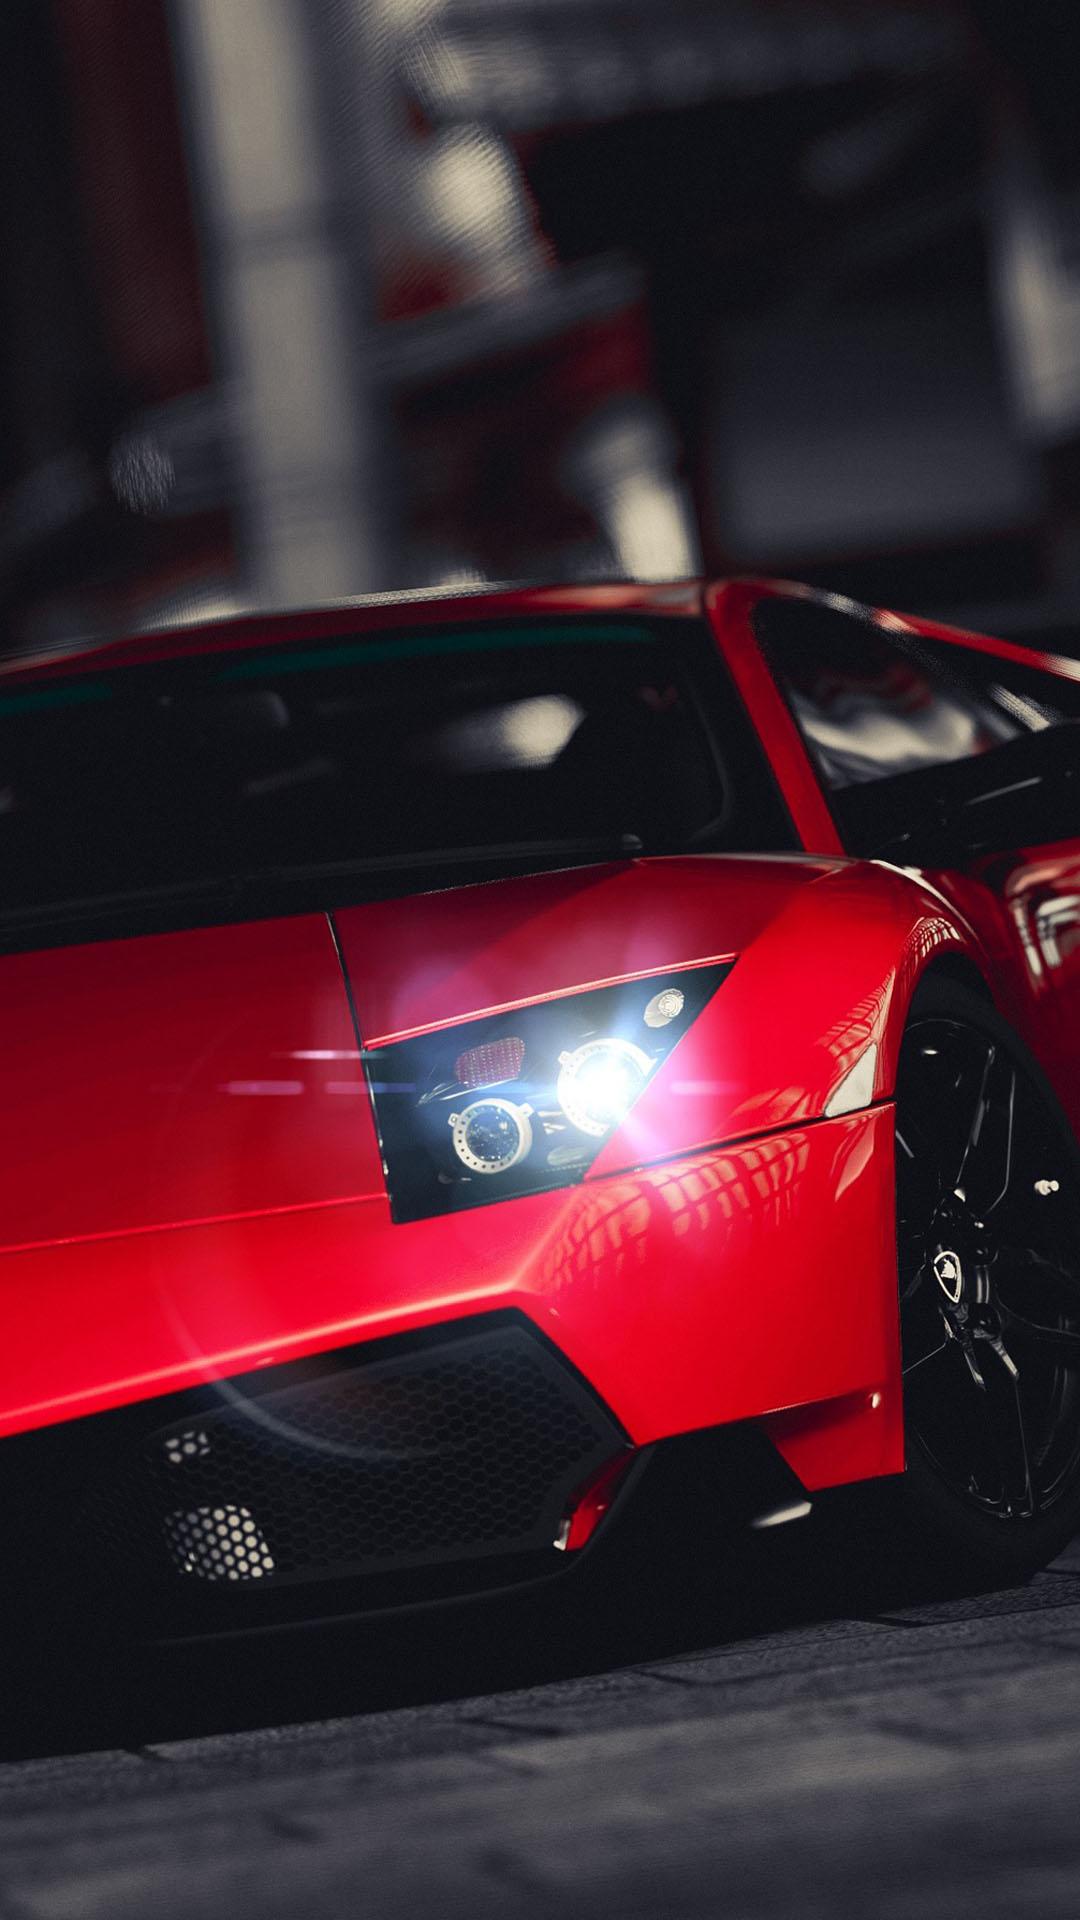 Hd iphone wallpaper lamborghini veneno bright red iphone 6 - Lamborghini veneno wallpaper android ...